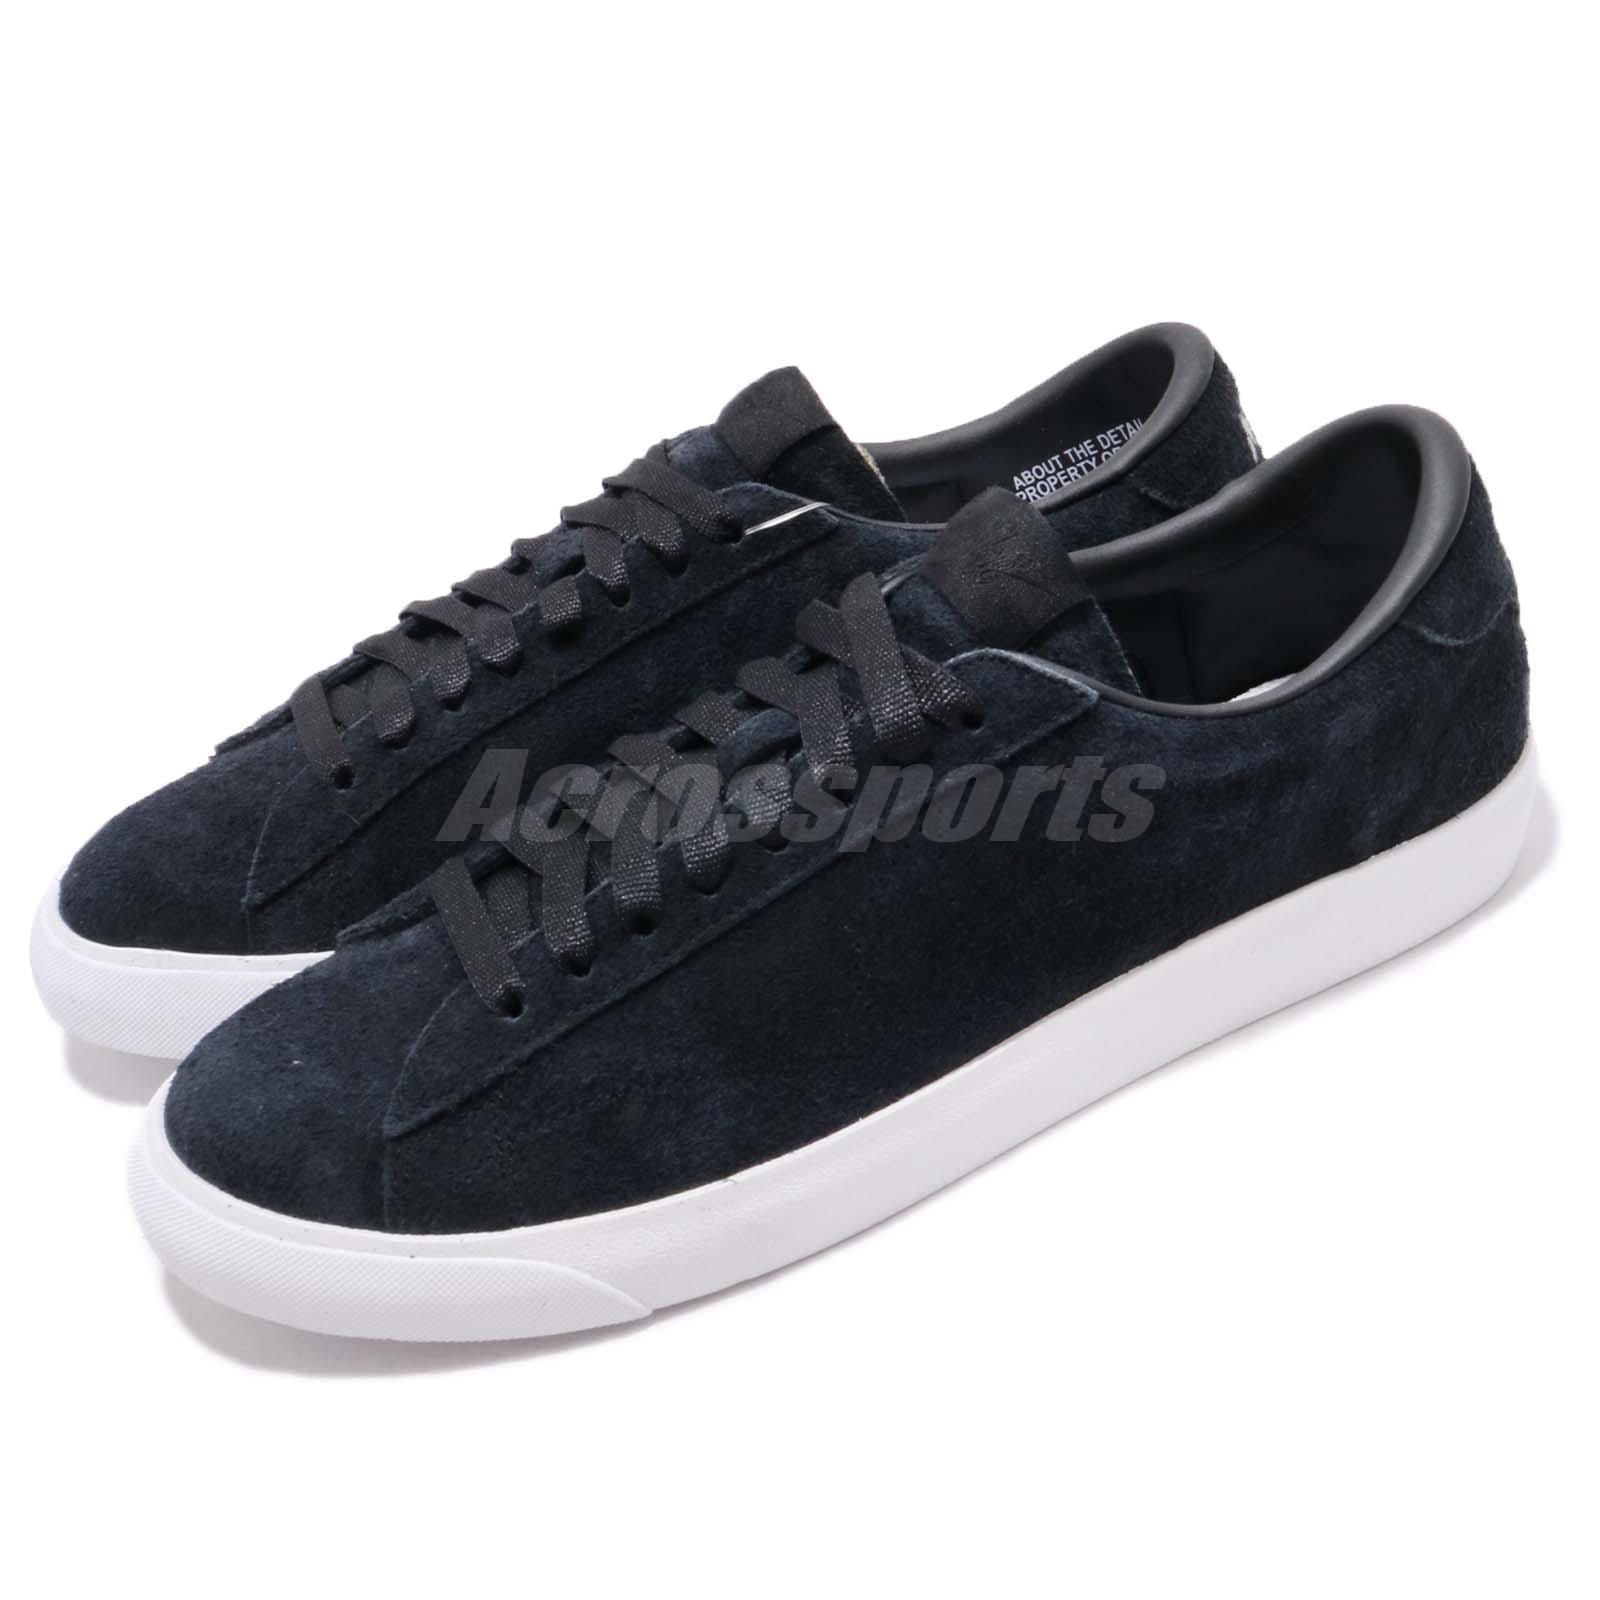 premium selection a5a21 1a34d Details about Fragment X Nike Tennis Classic AC SP Black White Men Casual  Shoes 693505-001